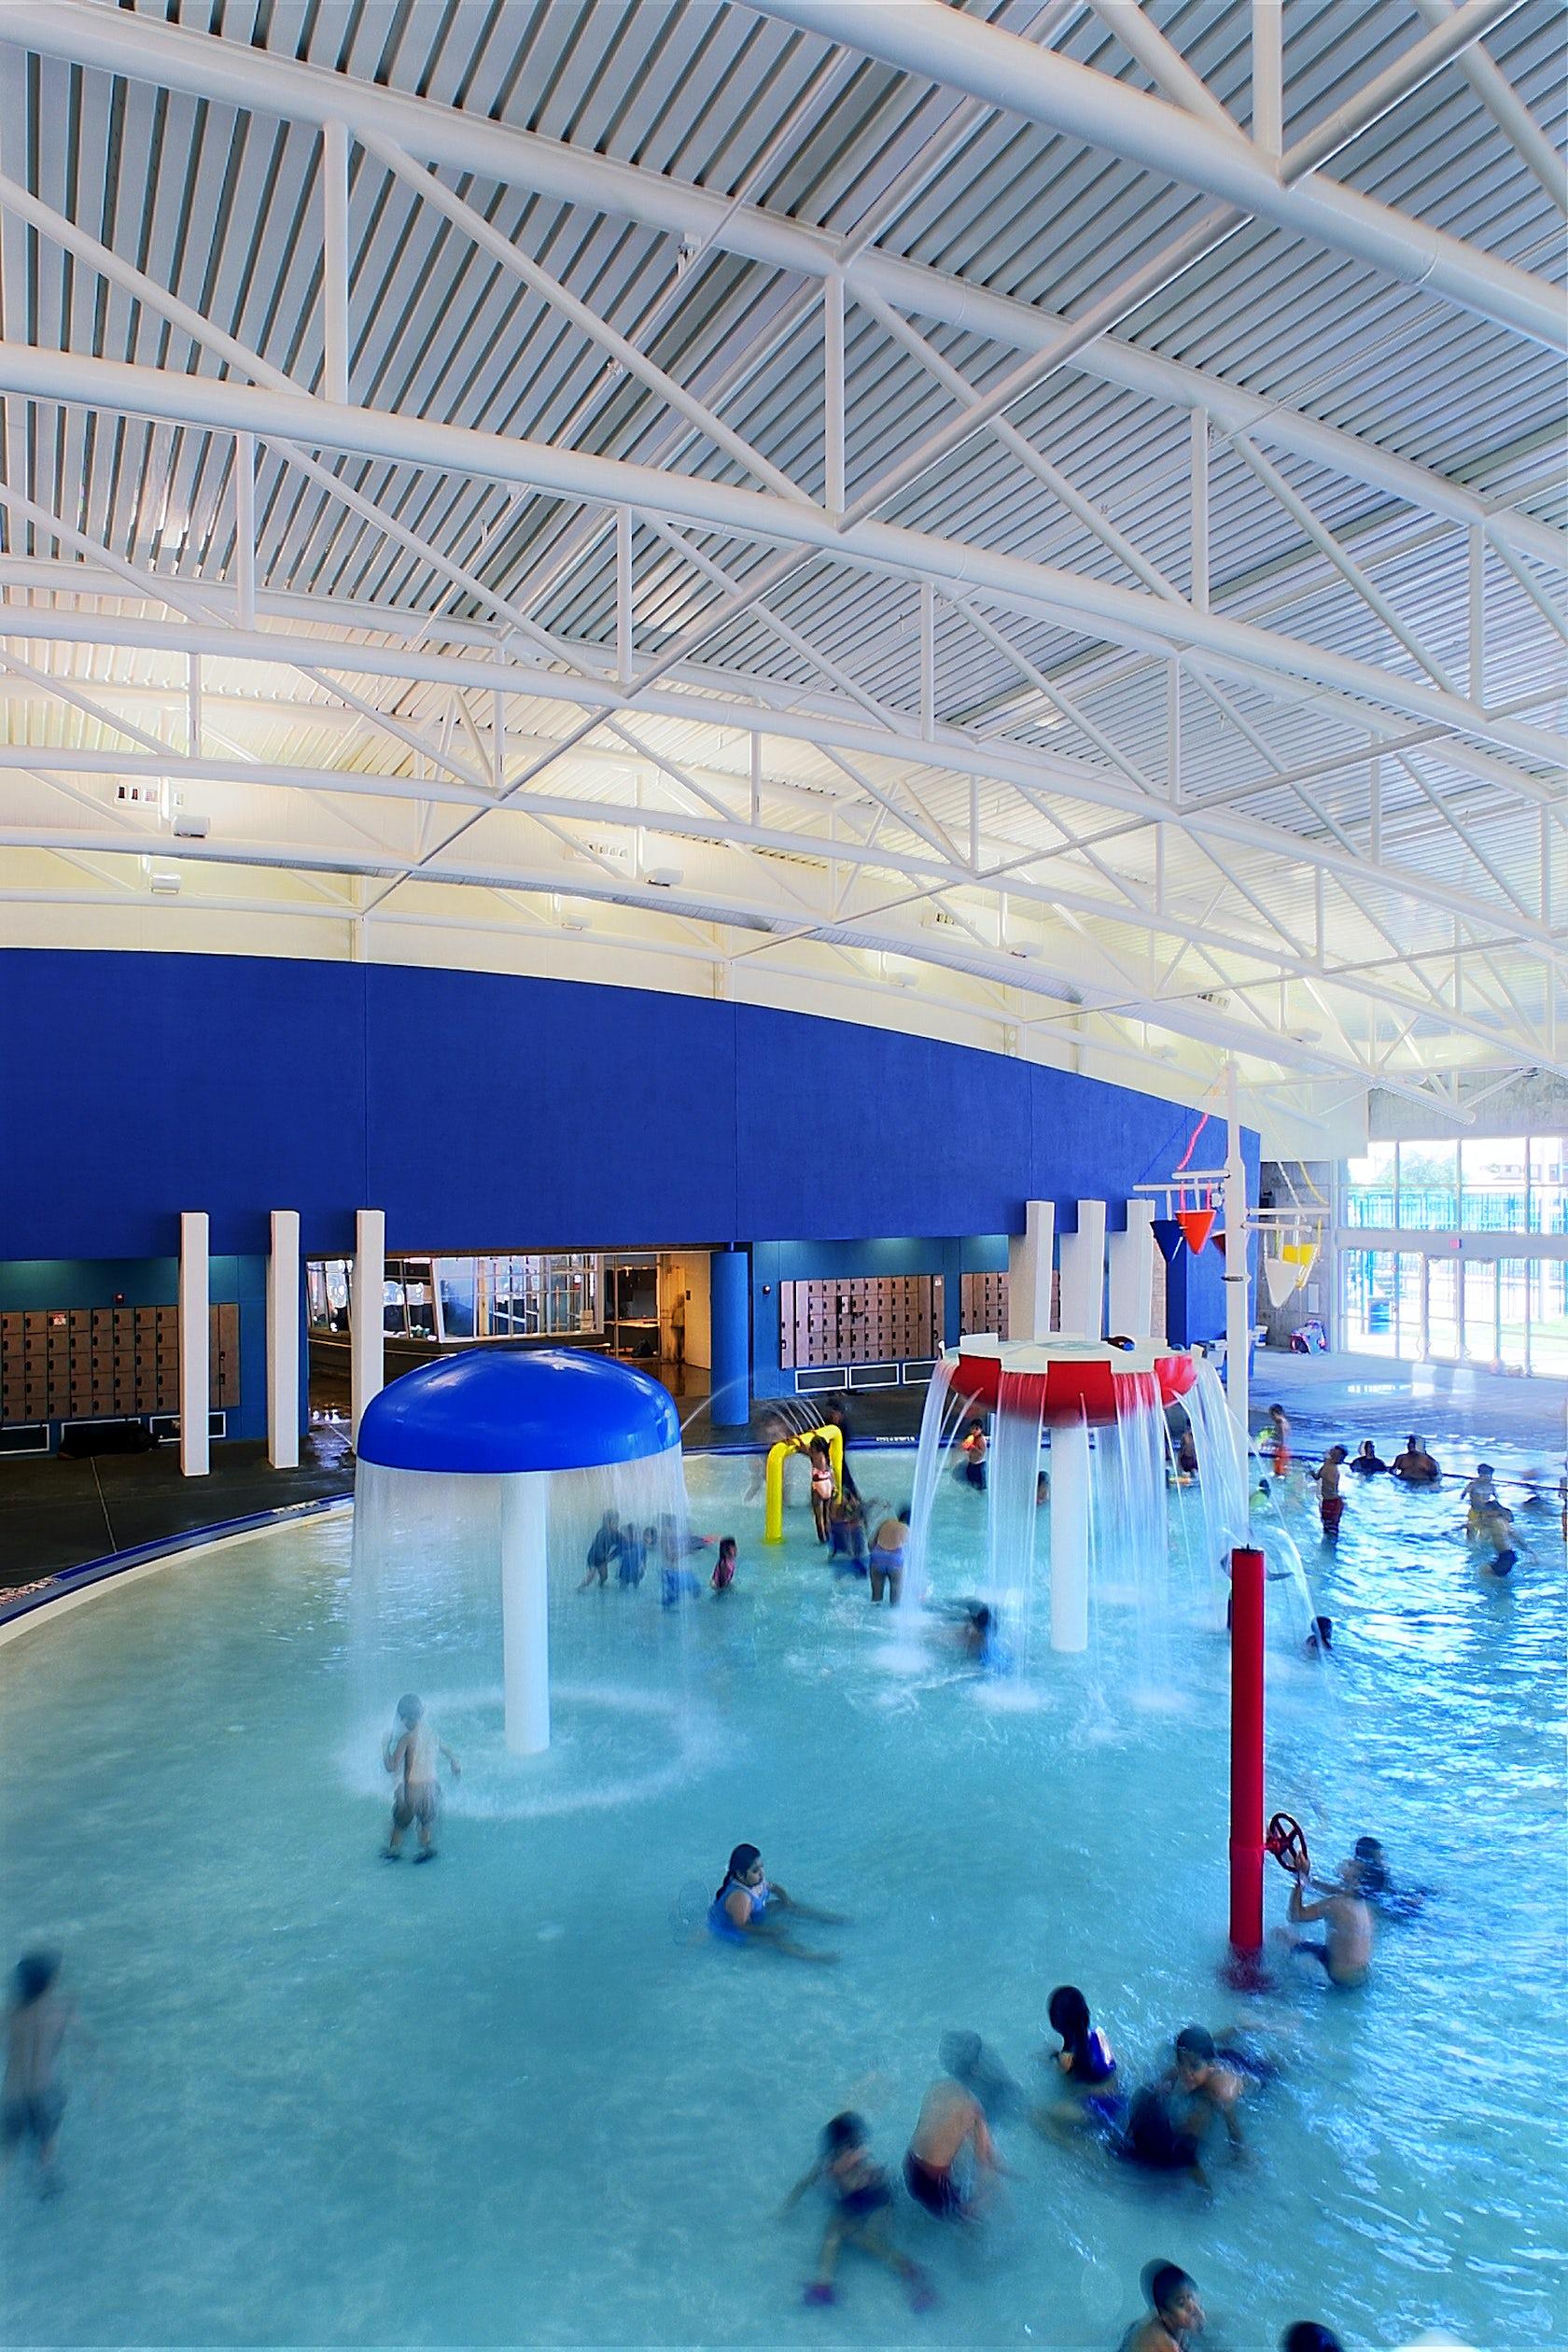 Marcos B Armijo Sports Aquatic Center Architizer